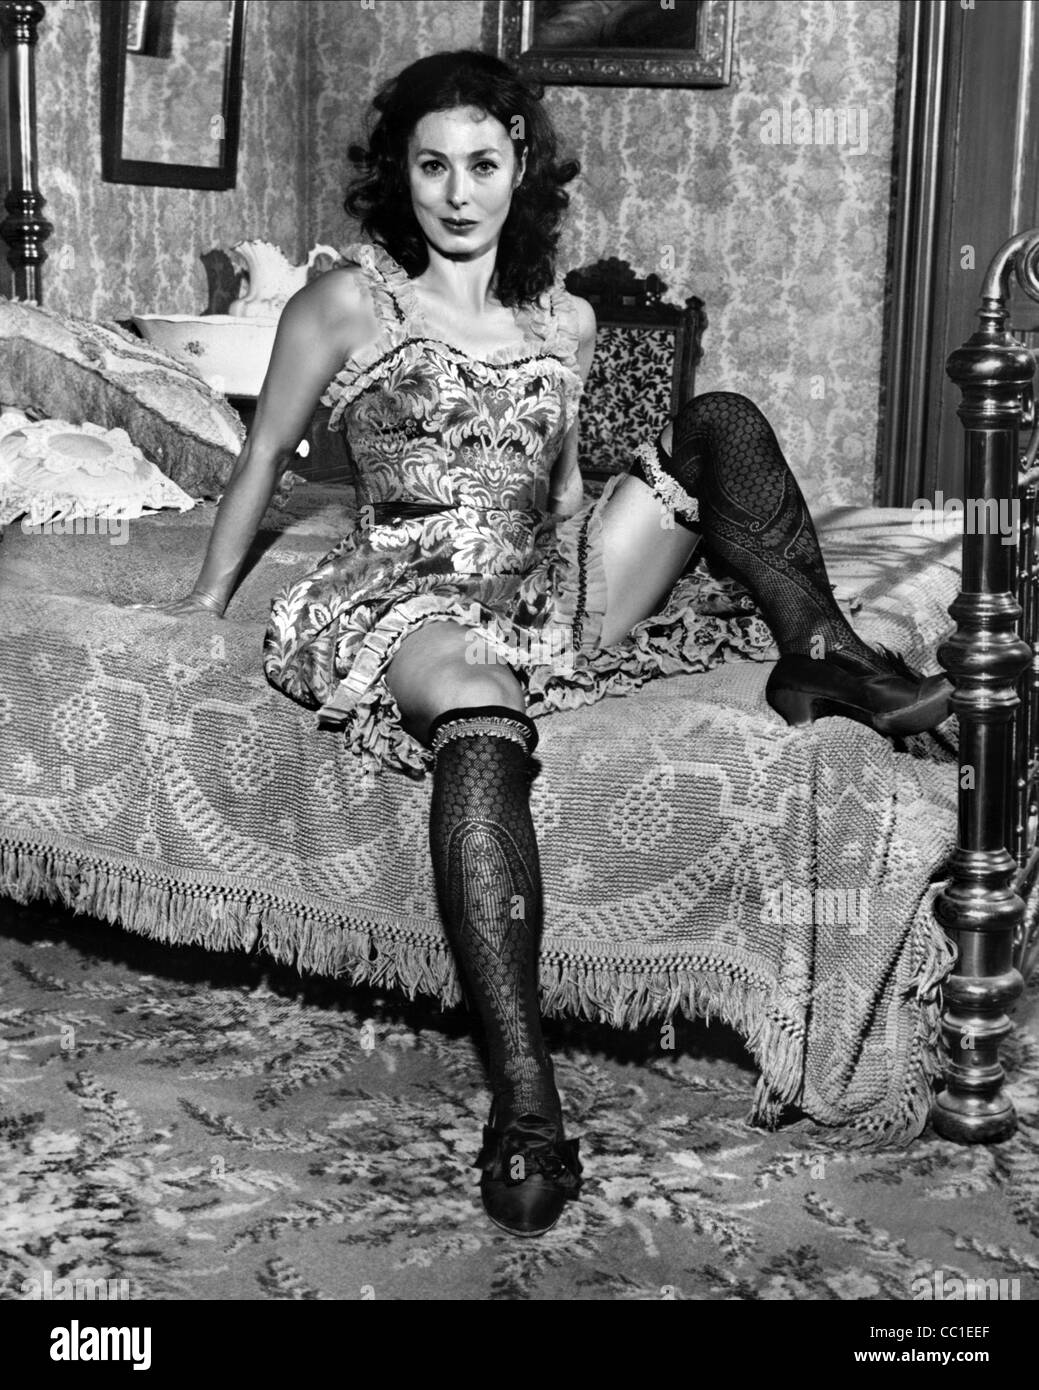 Barbara Jefford (born 1930) pictures